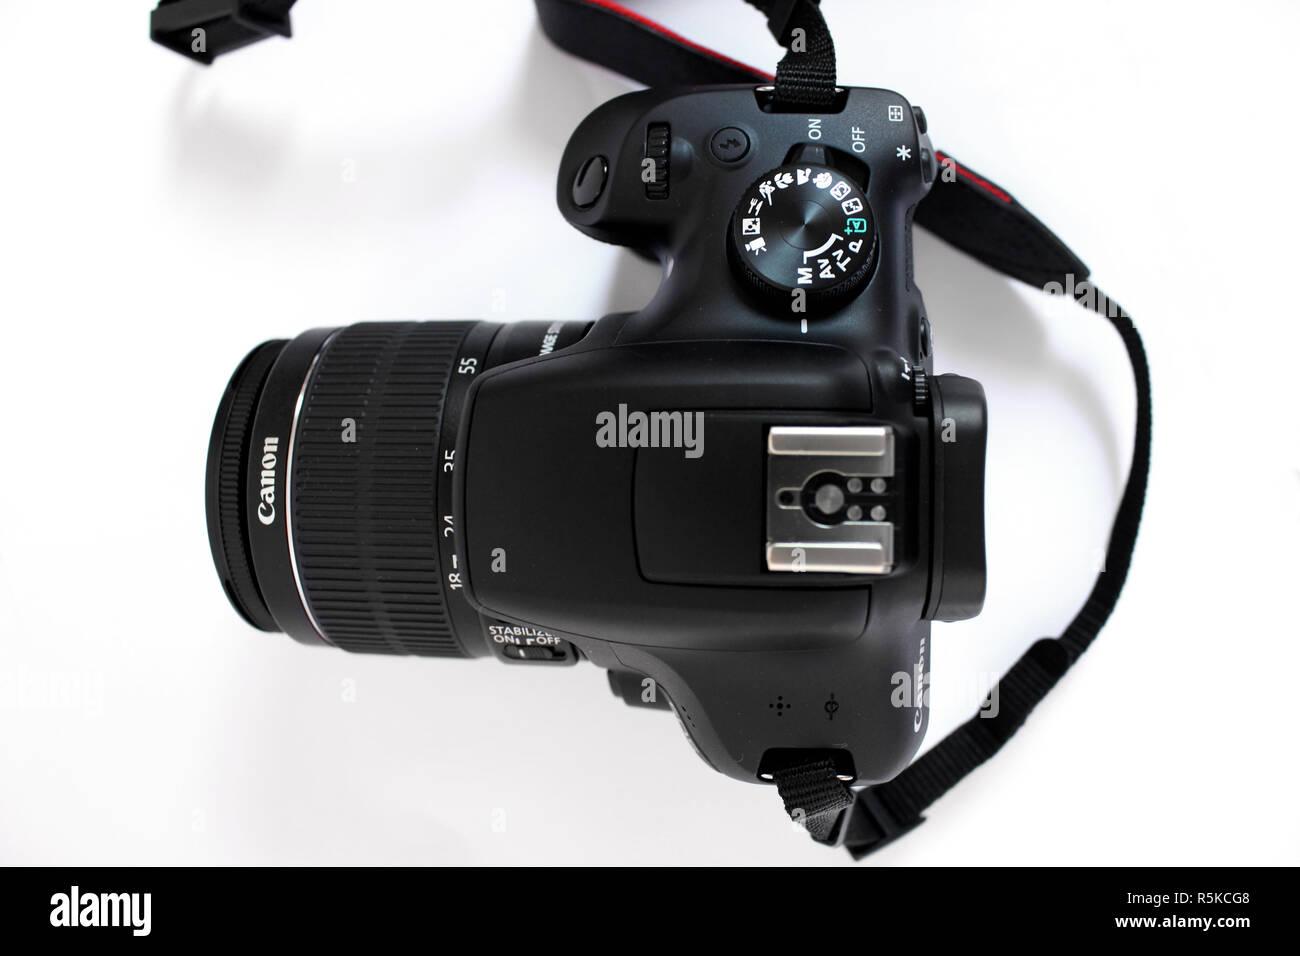 Camera Canon 1300d, lens efs 18-55mm, black, editorial, illustrative - Stock Image